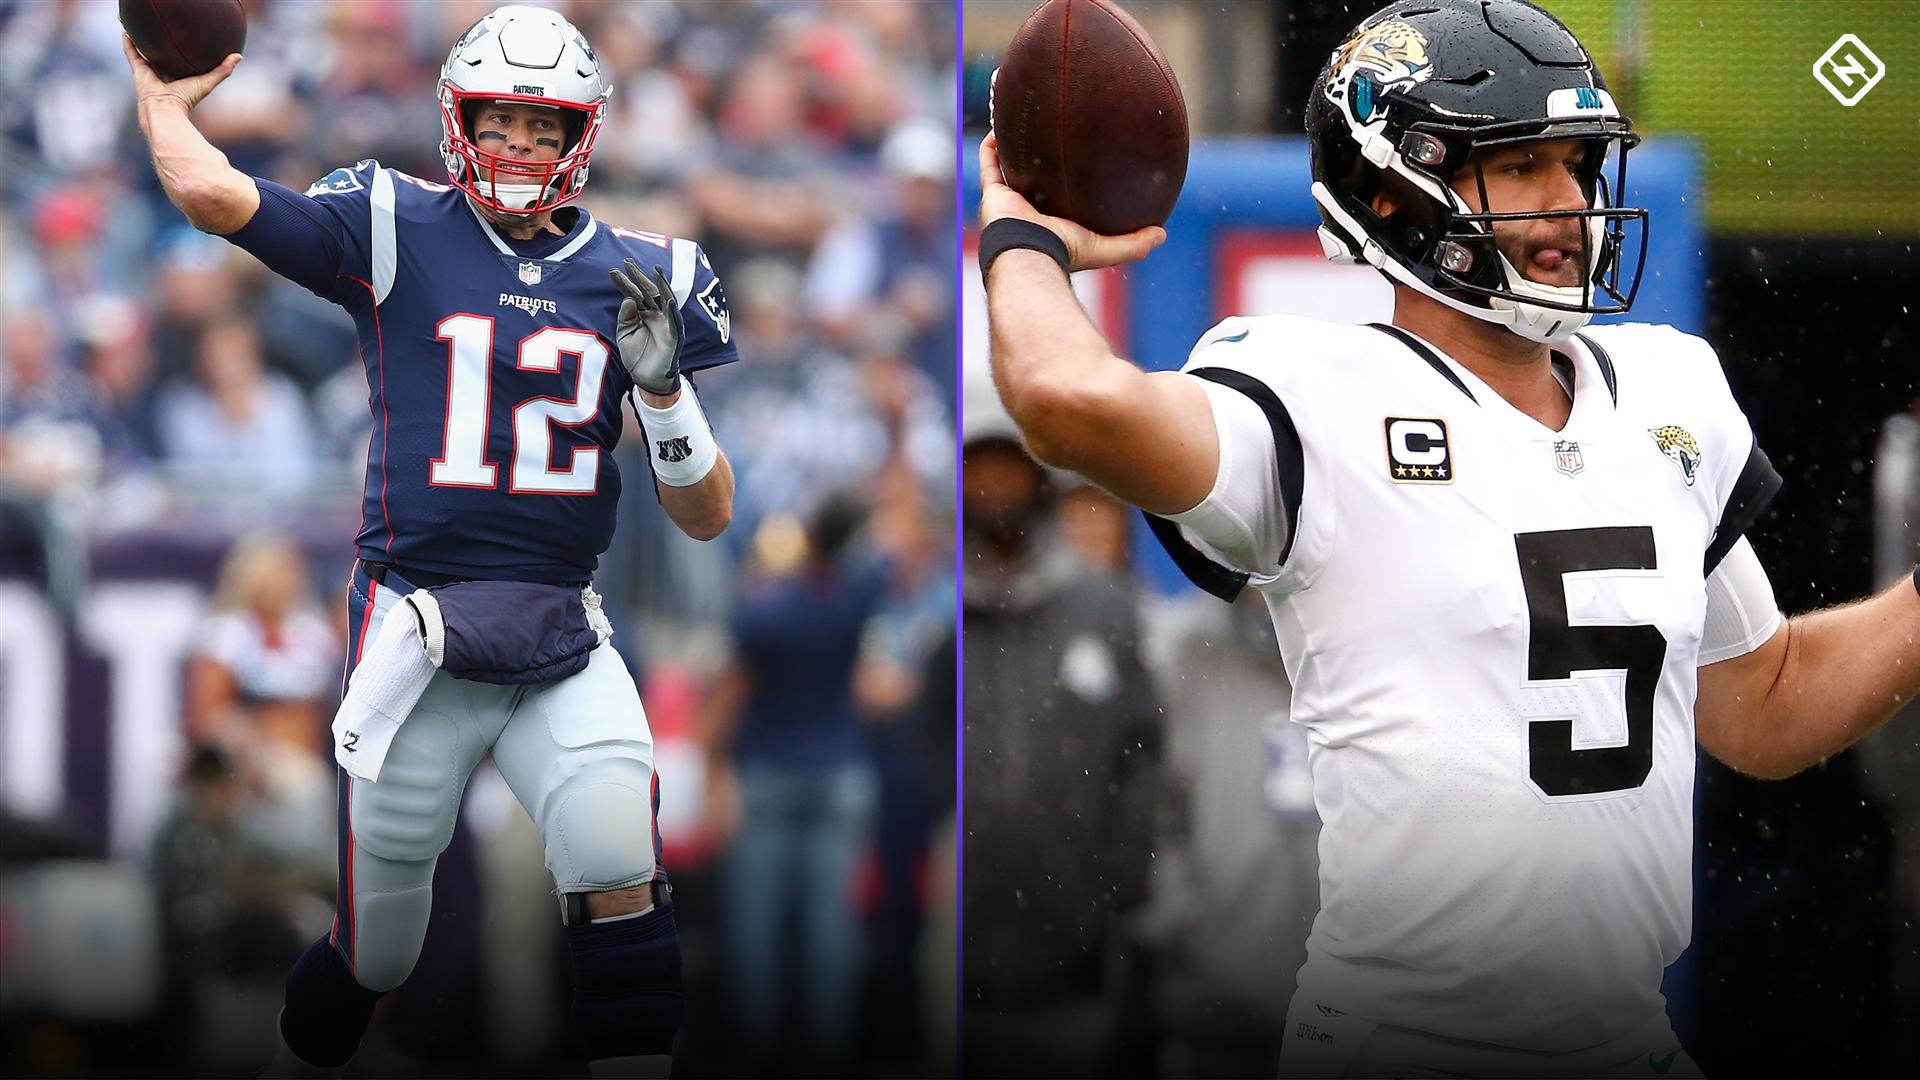 NFL Week 2 Weather Updates: Will Hurricane Florence affect any NFL games, fantasy start 'em/start 'em decisions?